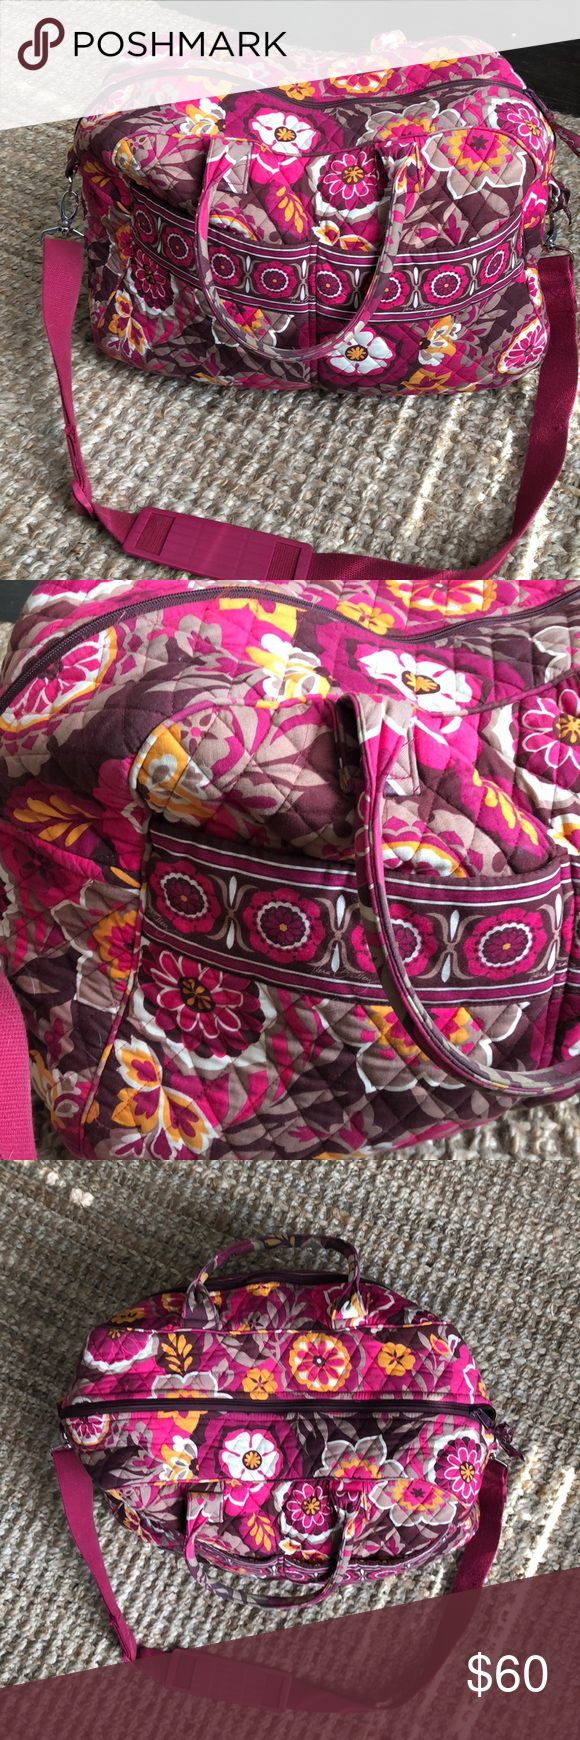 Cute Vera Bradley travel tote Cute Vera Bradley travel tote - great condition. The bottom length is about 17 inches Vera Bradley Bags Travel Bags